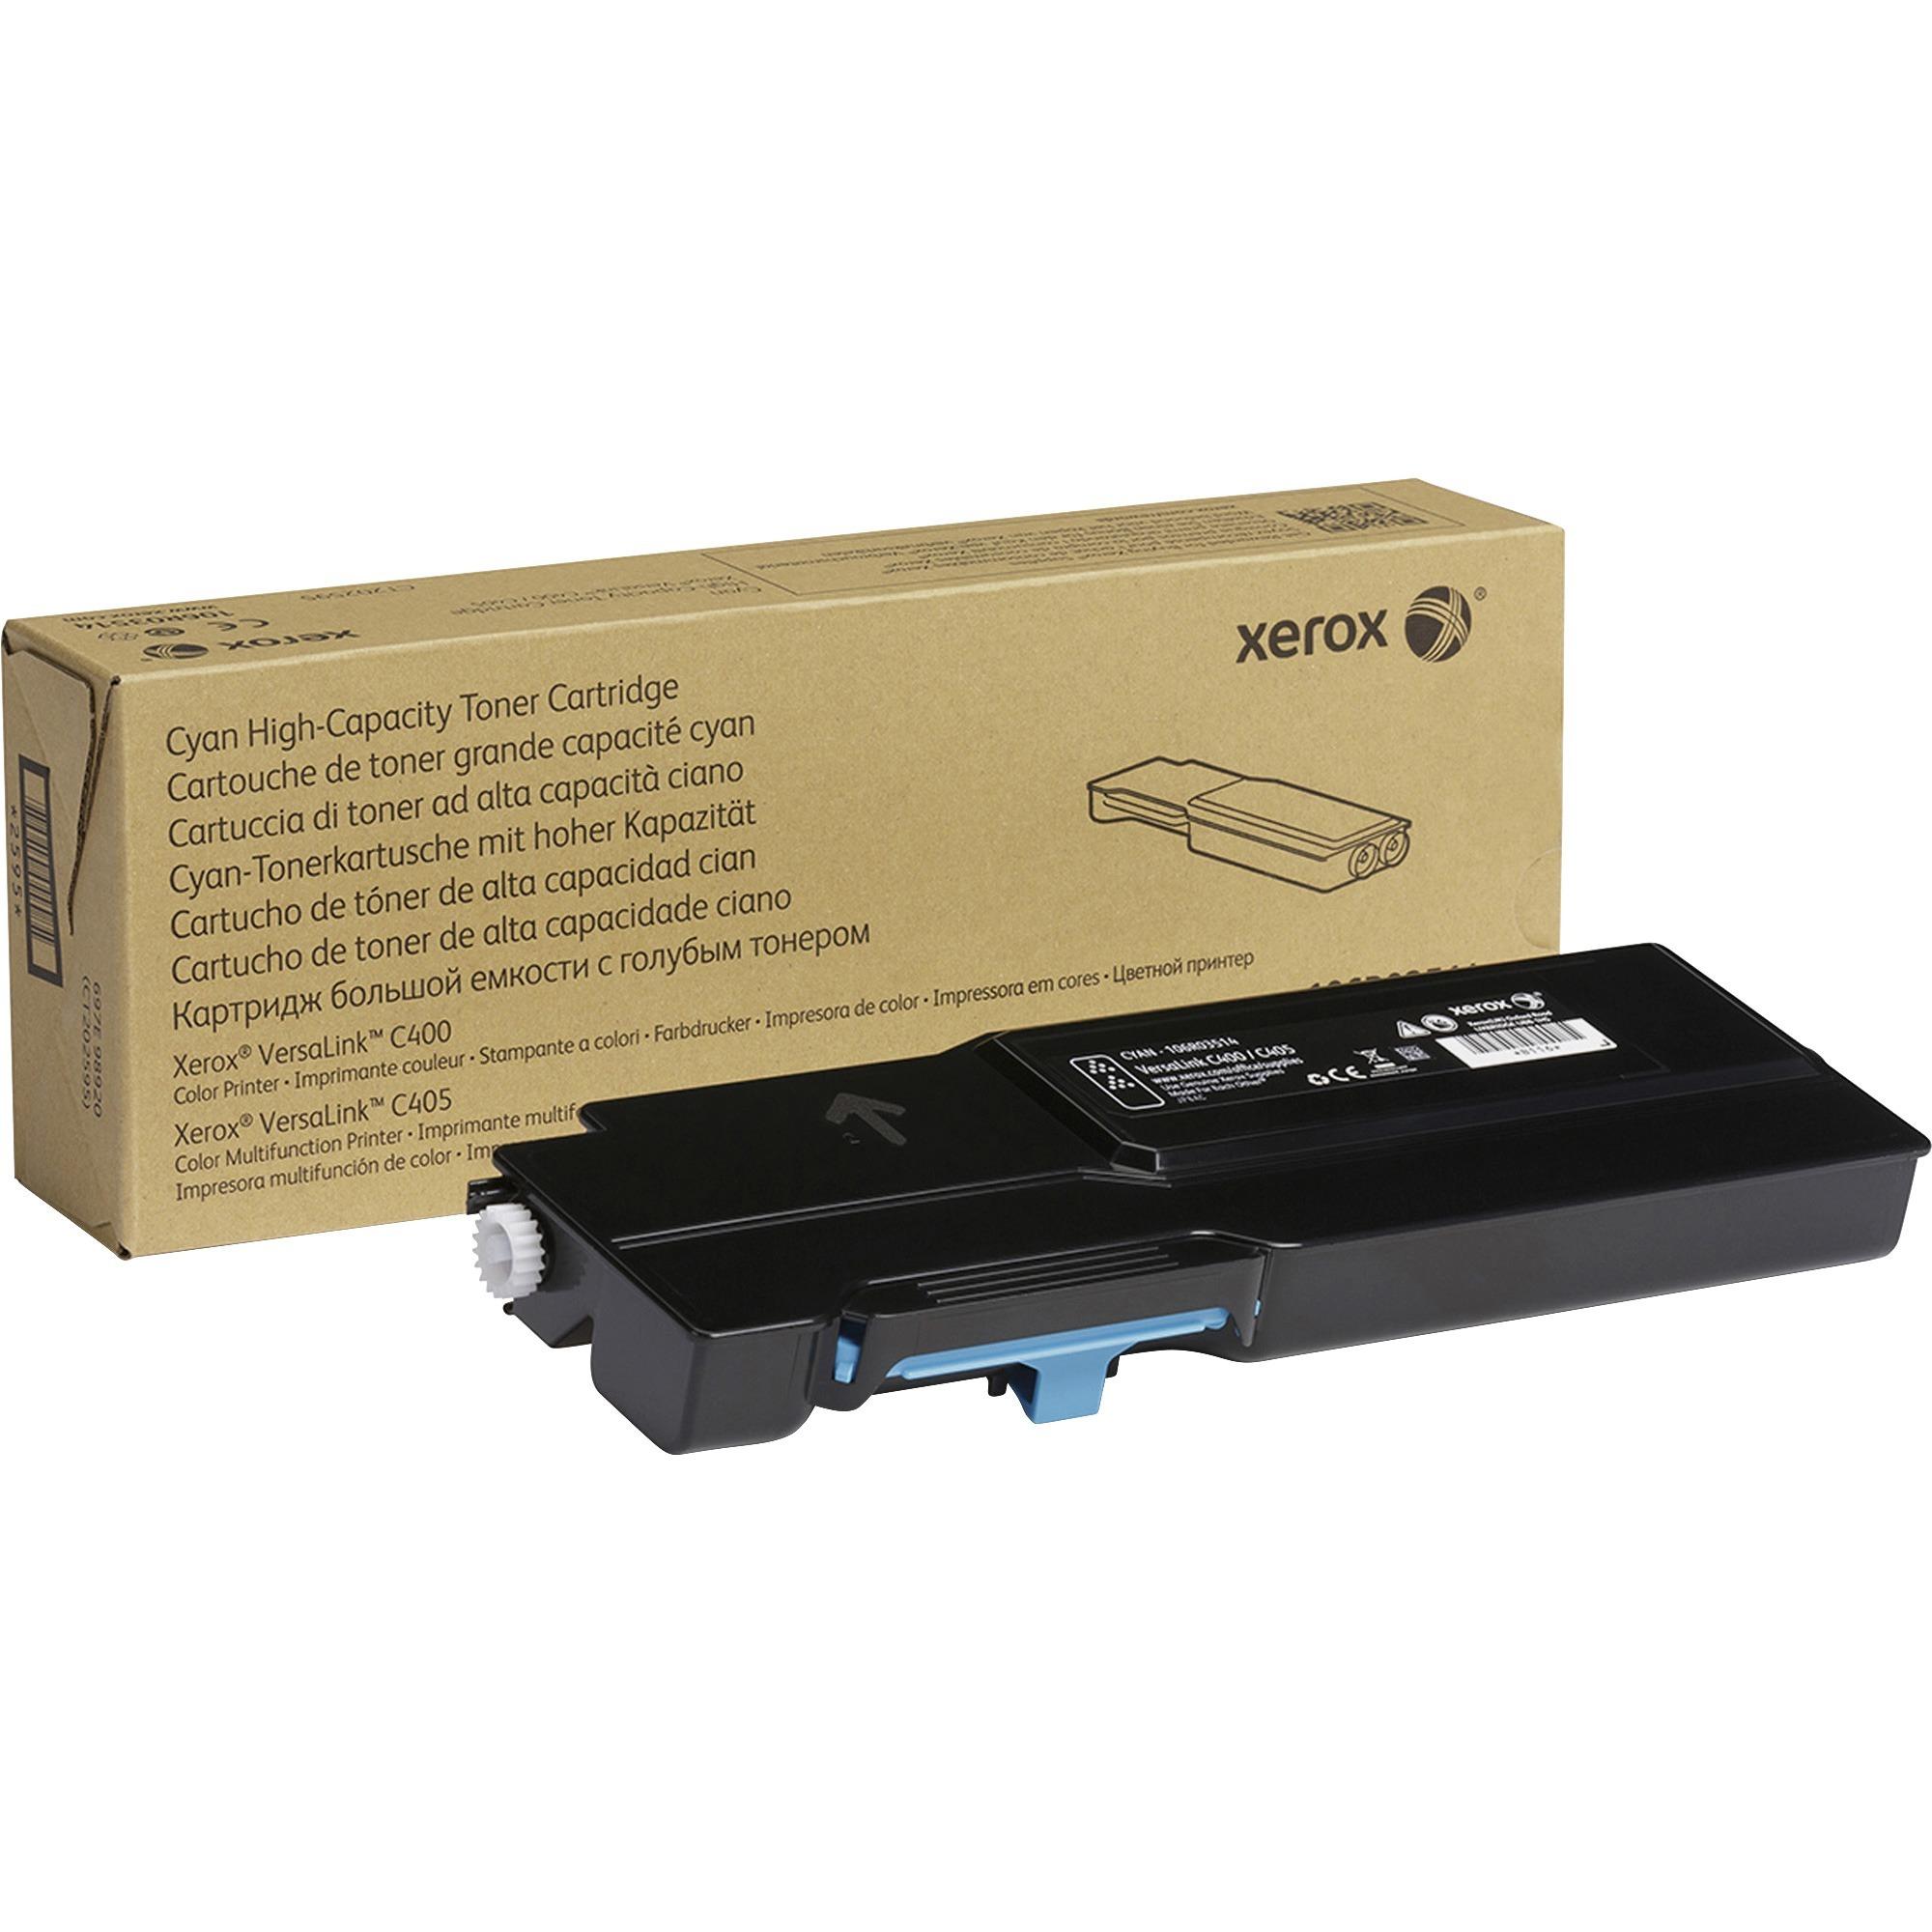 Xerox, XER106R03514, Genuine Cyan High Capacity Toner Cartridge For The VersaLink C400/C405, 1 Each